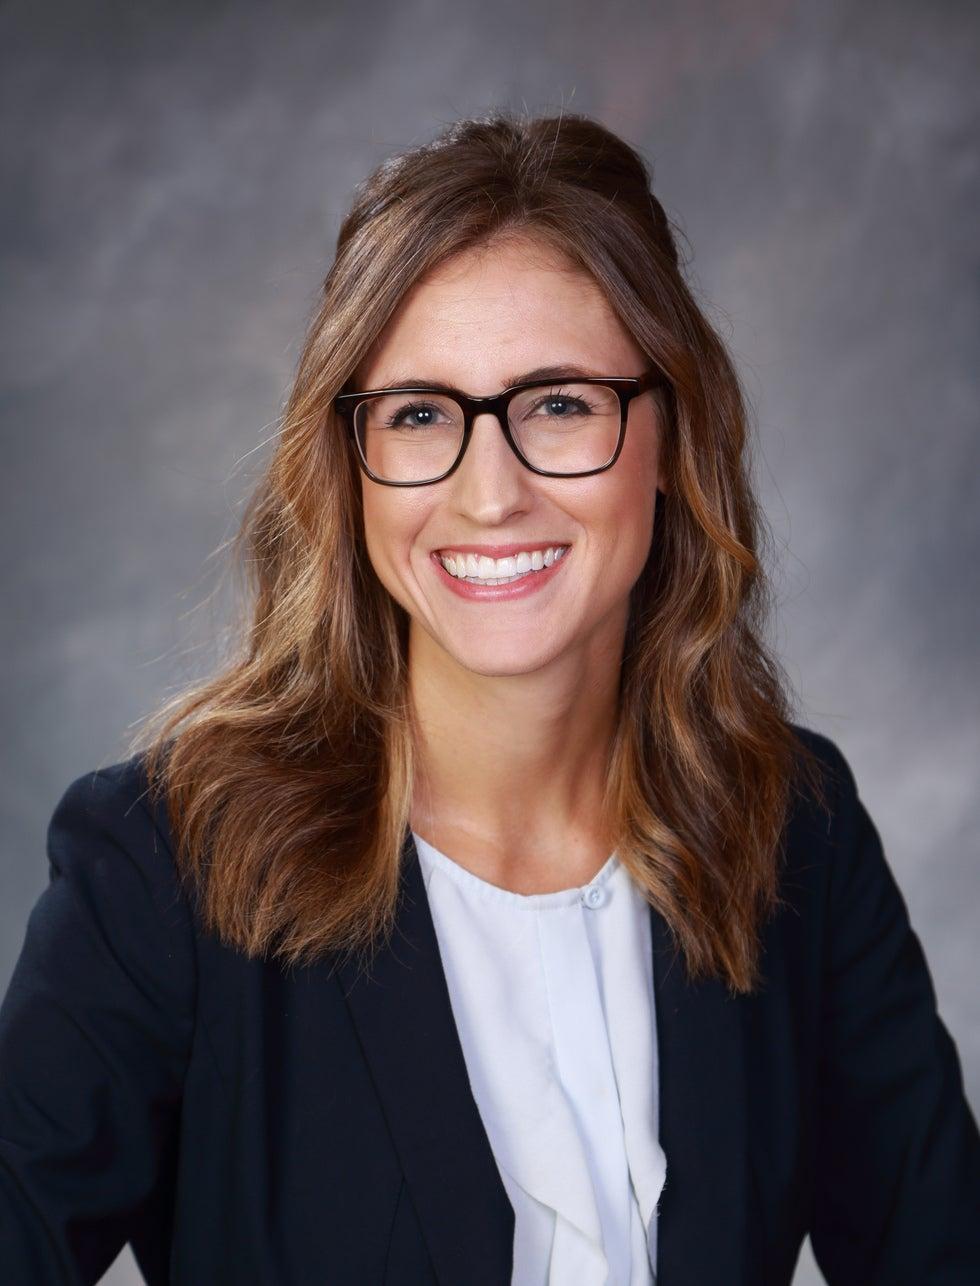 Lawyer Christi Schofield